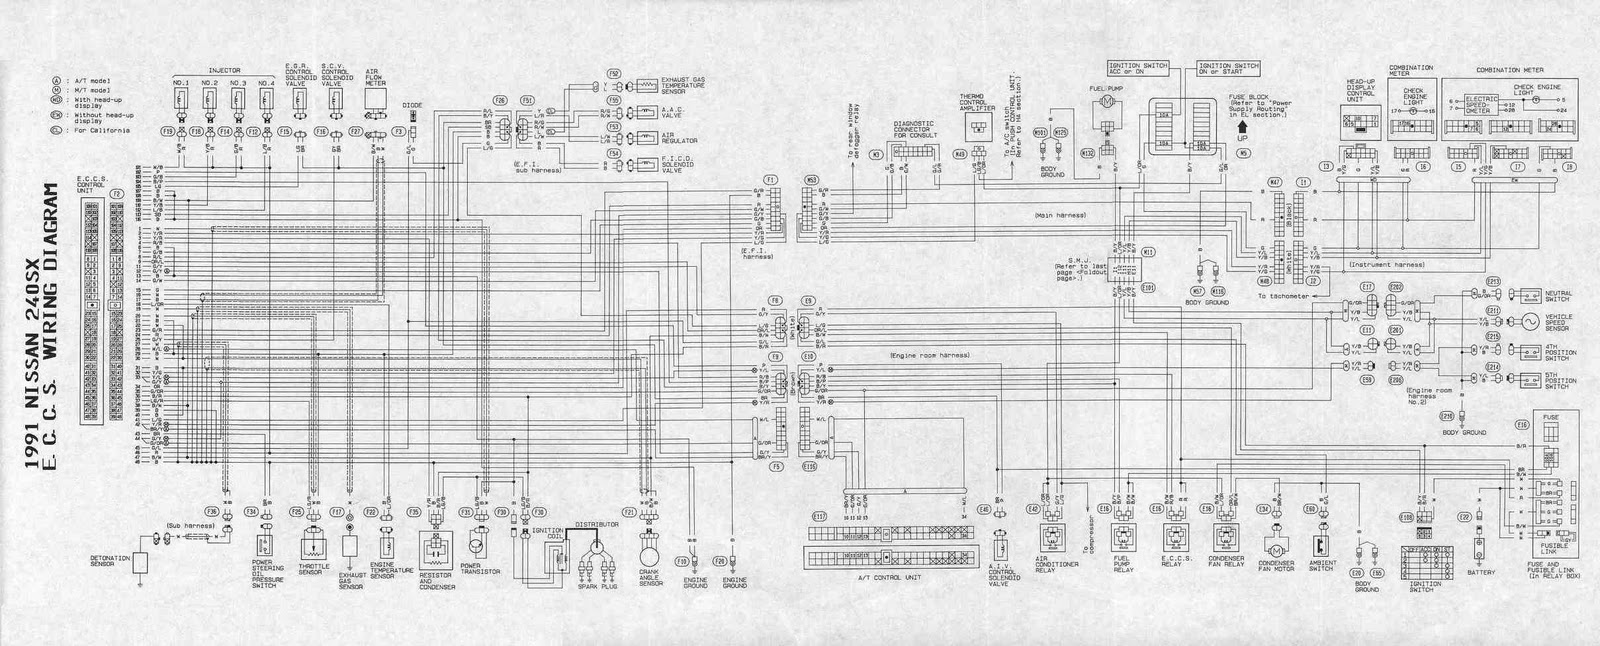 Nissan 240SX 1991 ECCS Wiring Diagram